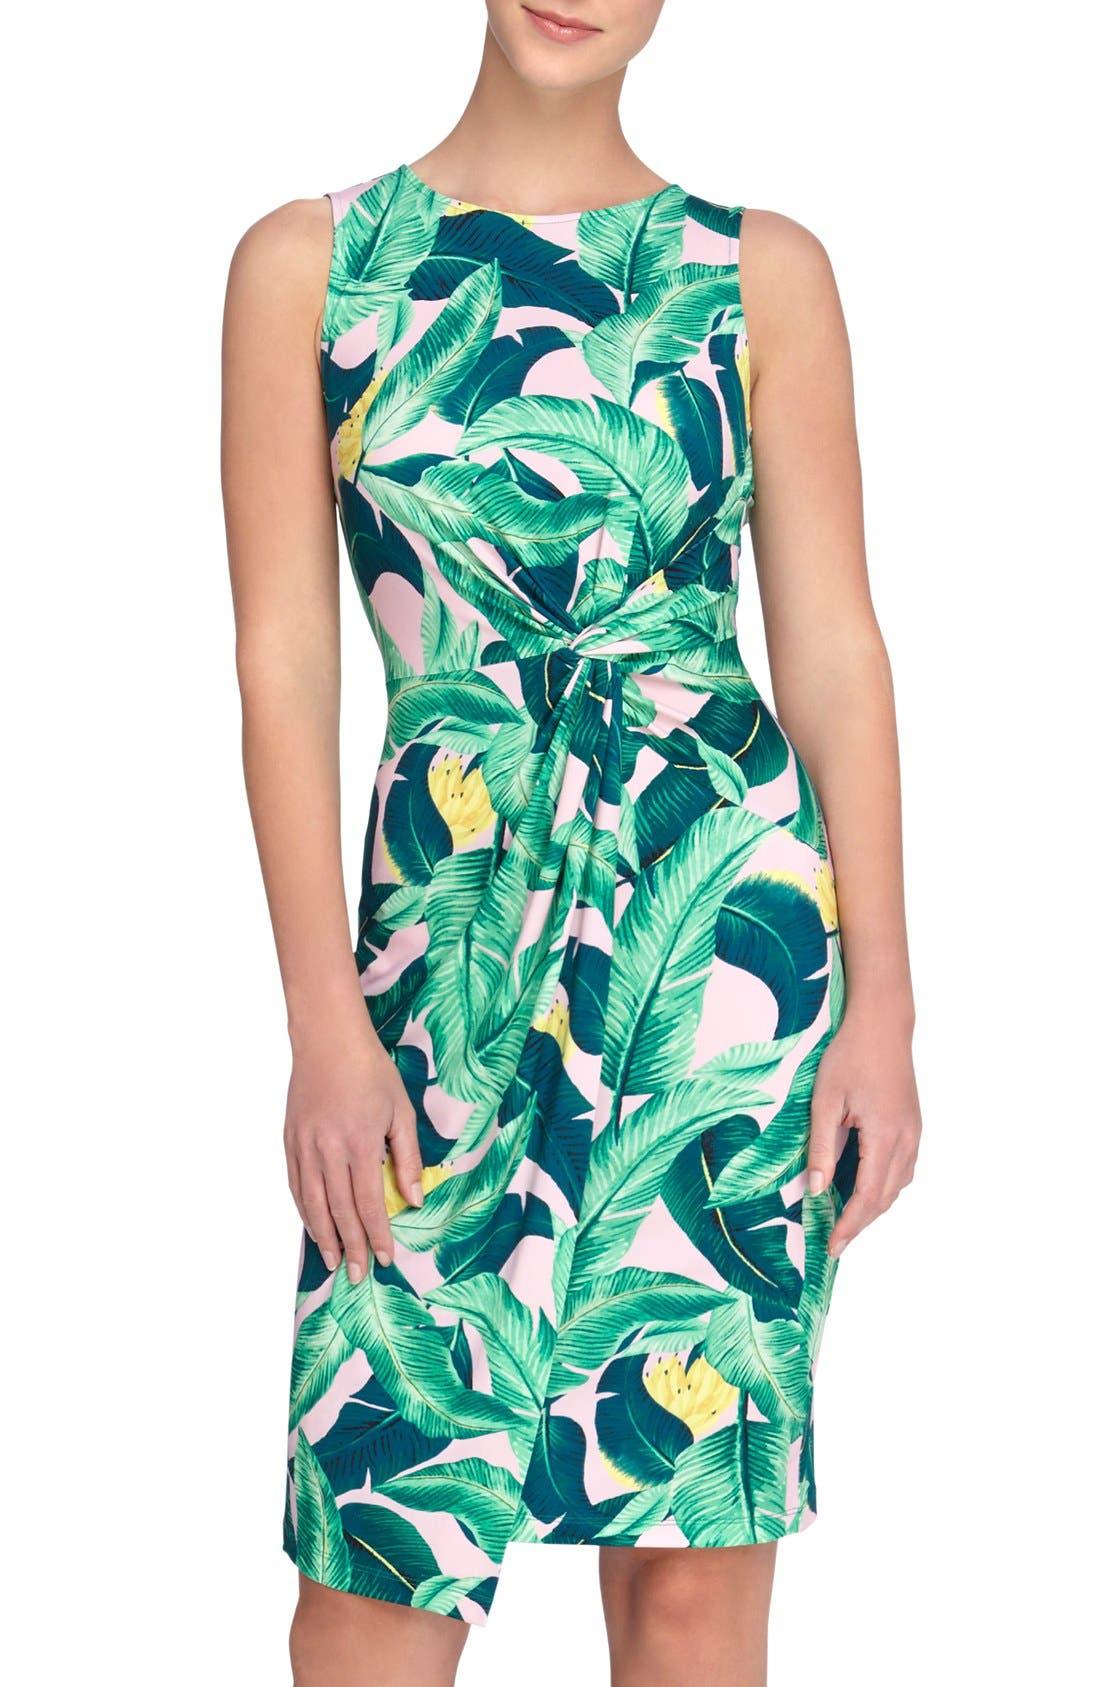 Main Image - Catherine Catherine Malandrino 'Adele' Tropical Print Sheath Dress